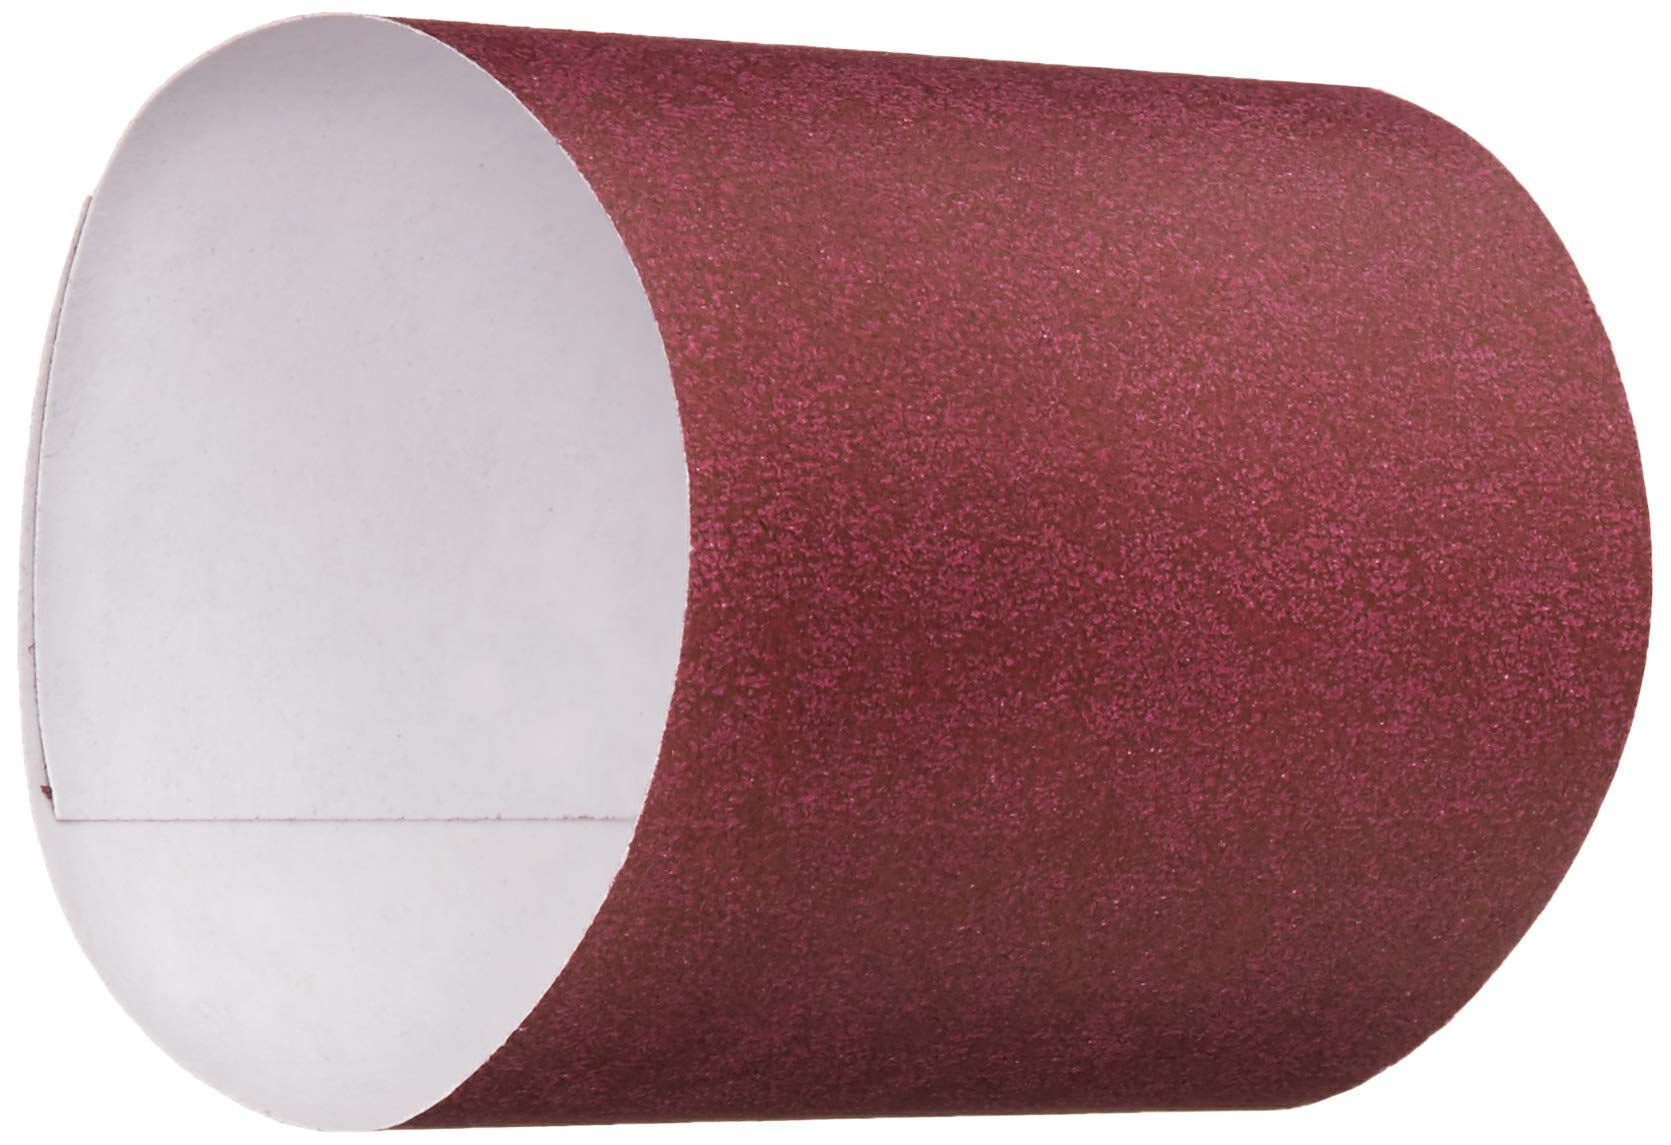 AmazonBasics Napkin Band, 4.25'' x 1.5'', Burgundy Red, 10000-Count